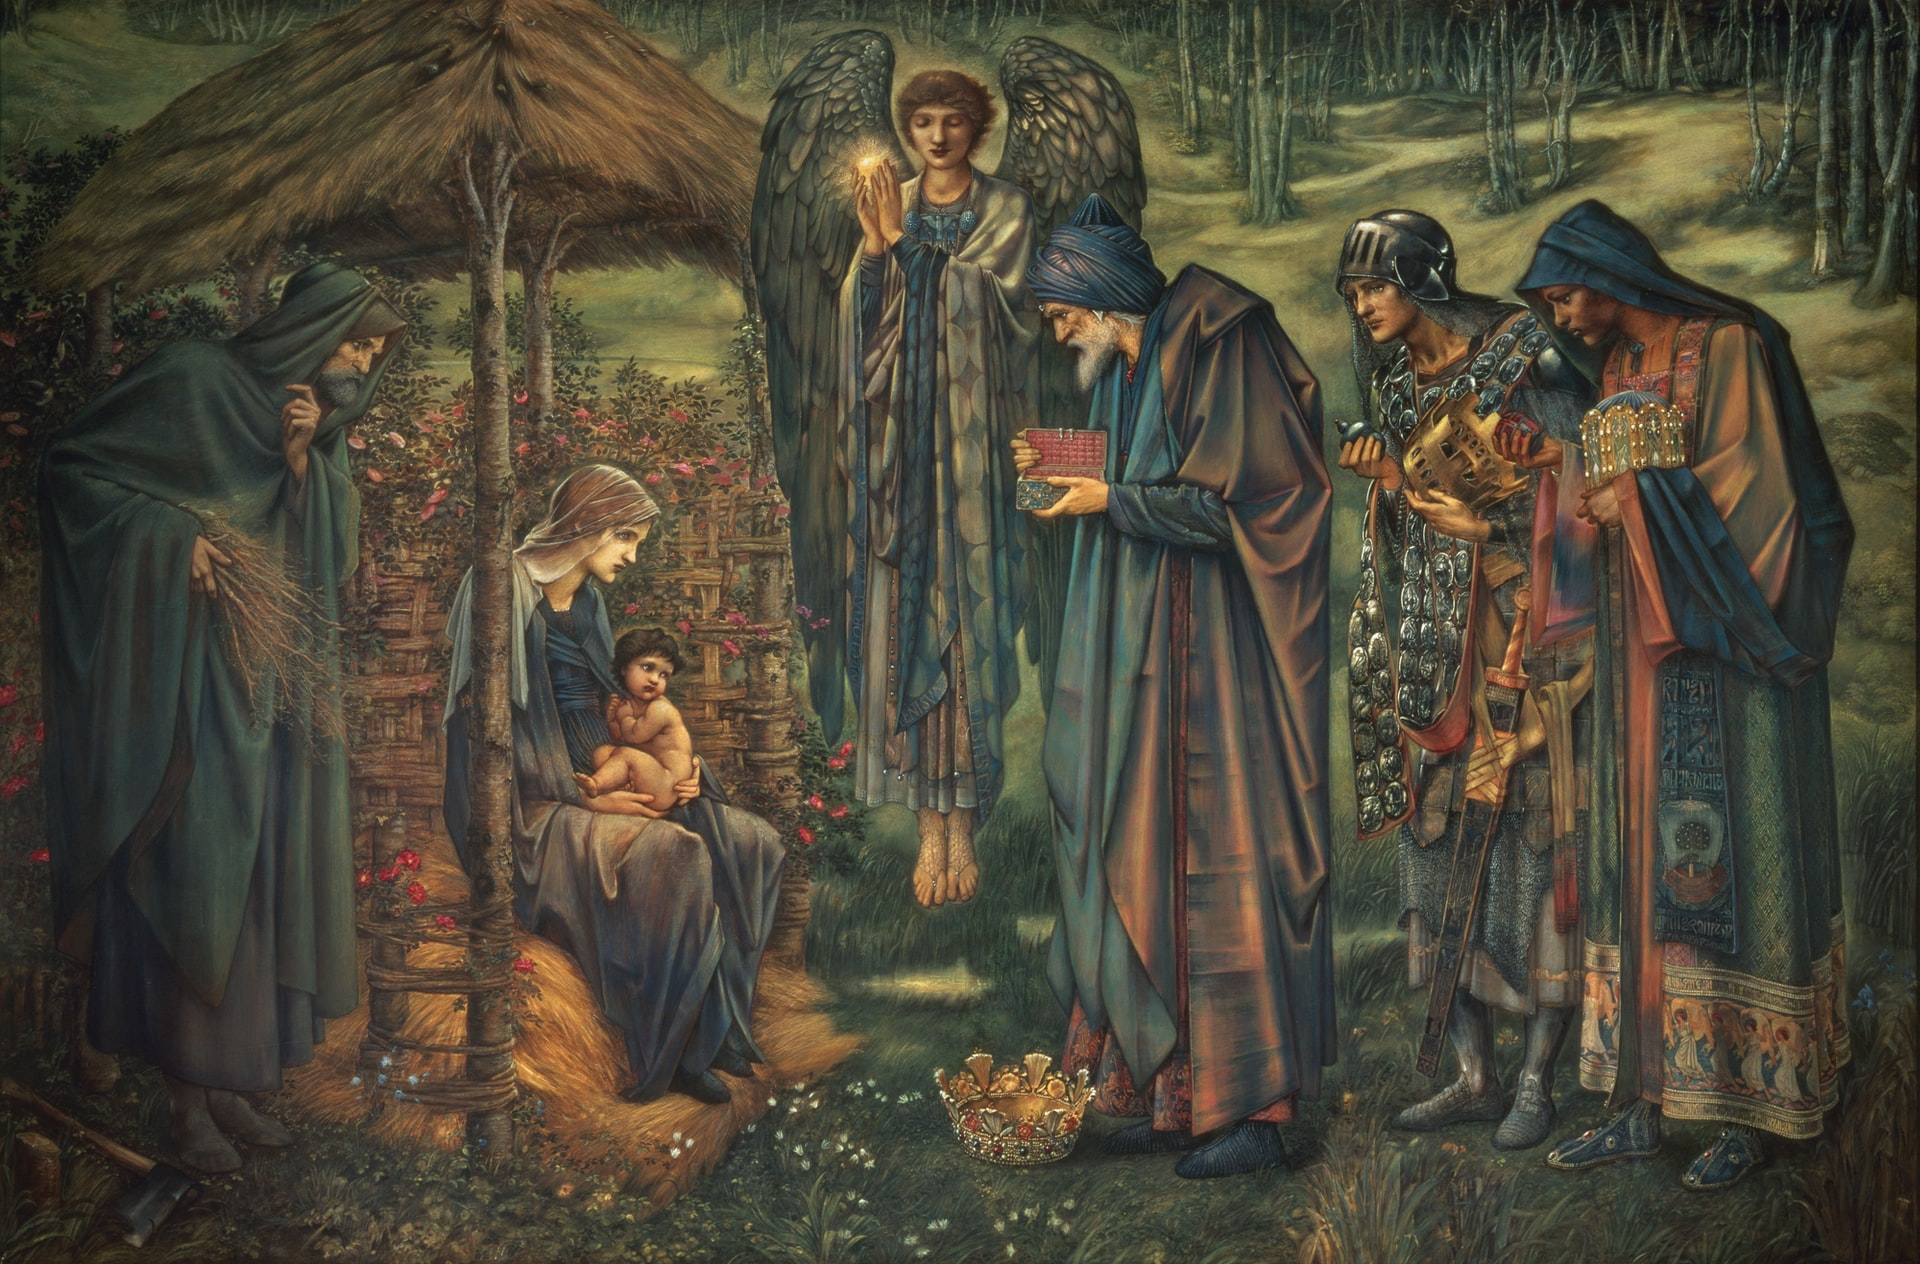 painting of magi visiting baby jesus www.atozmomm.com